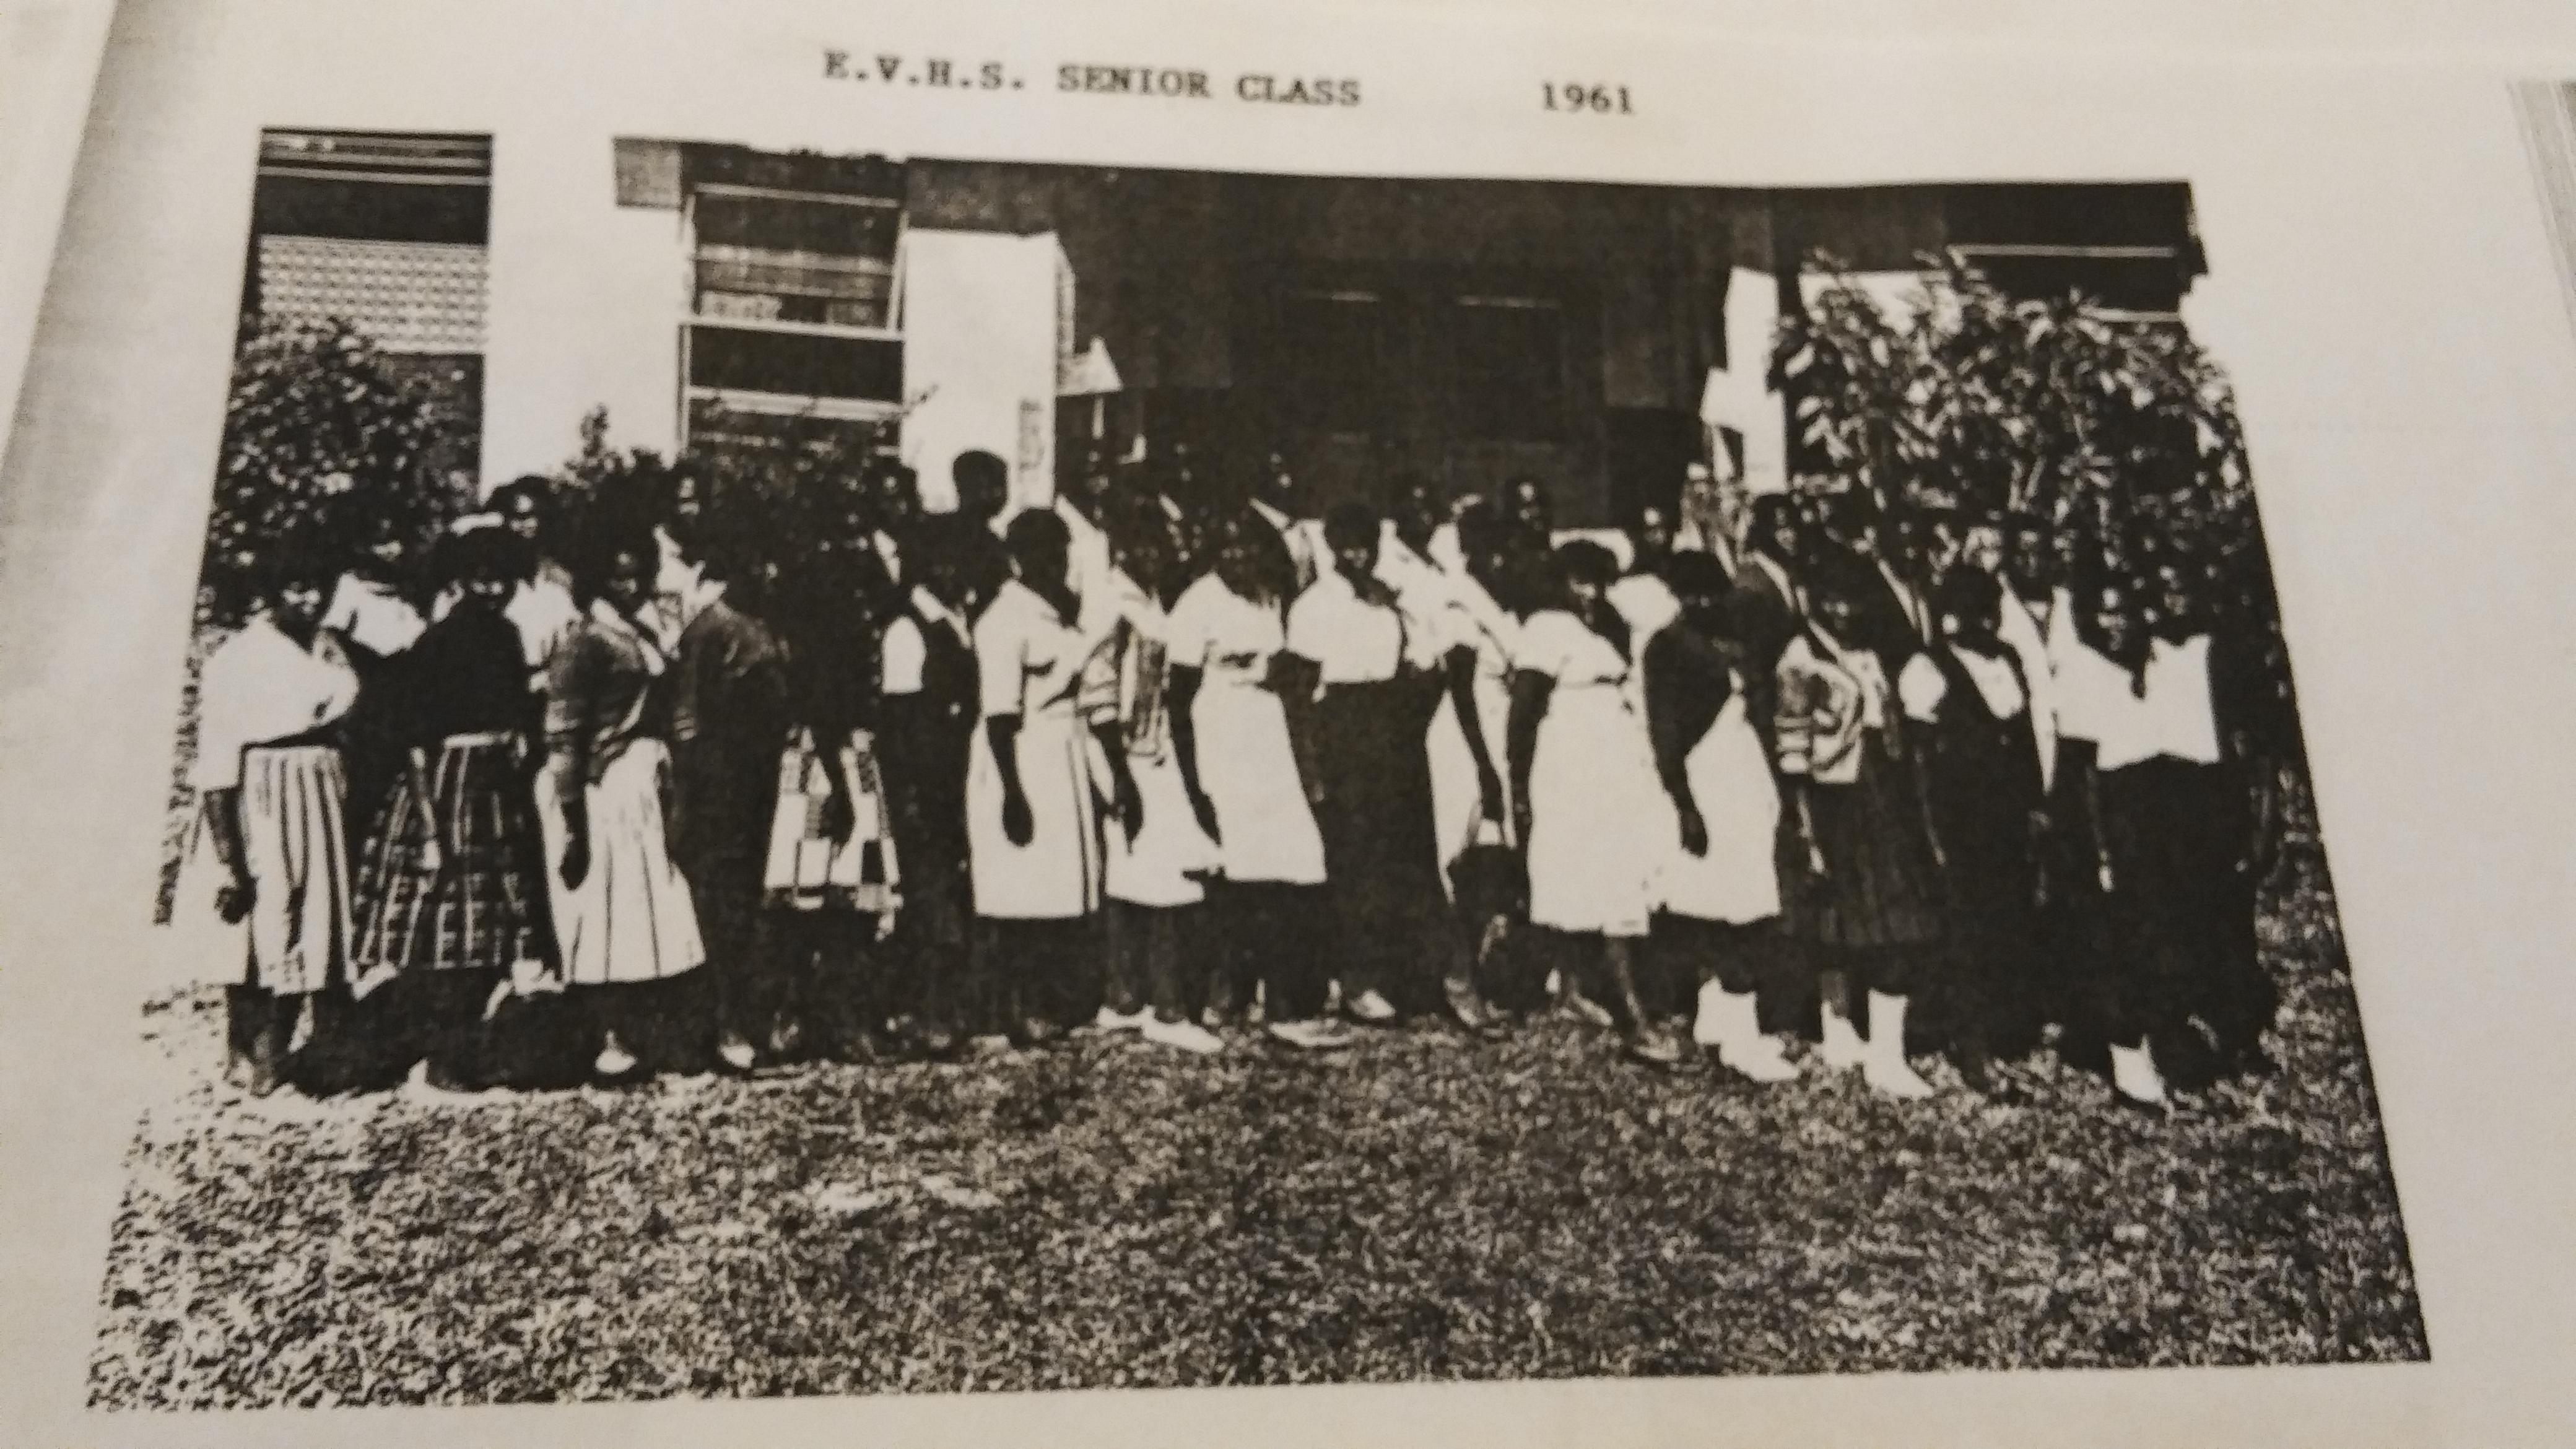 Eustis Vocational High School Senior Class of 1961